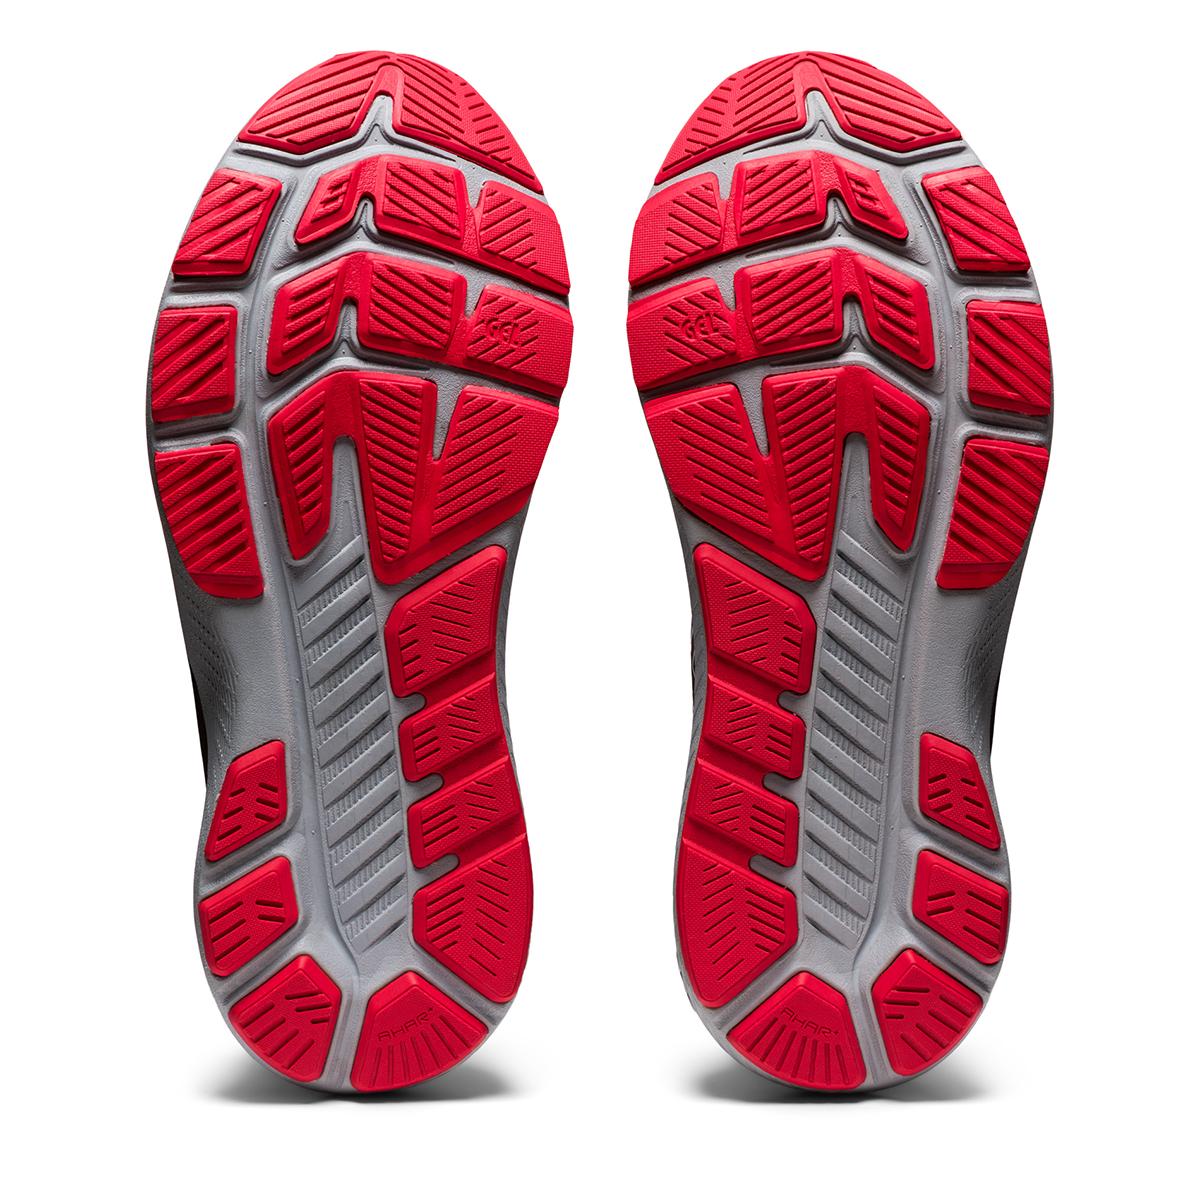 Men's Asics Gel-Kayano Lite 2 Running Shoe - Color: Black/White - Size: 7 - Width: Regular, Black/White, large, image 4